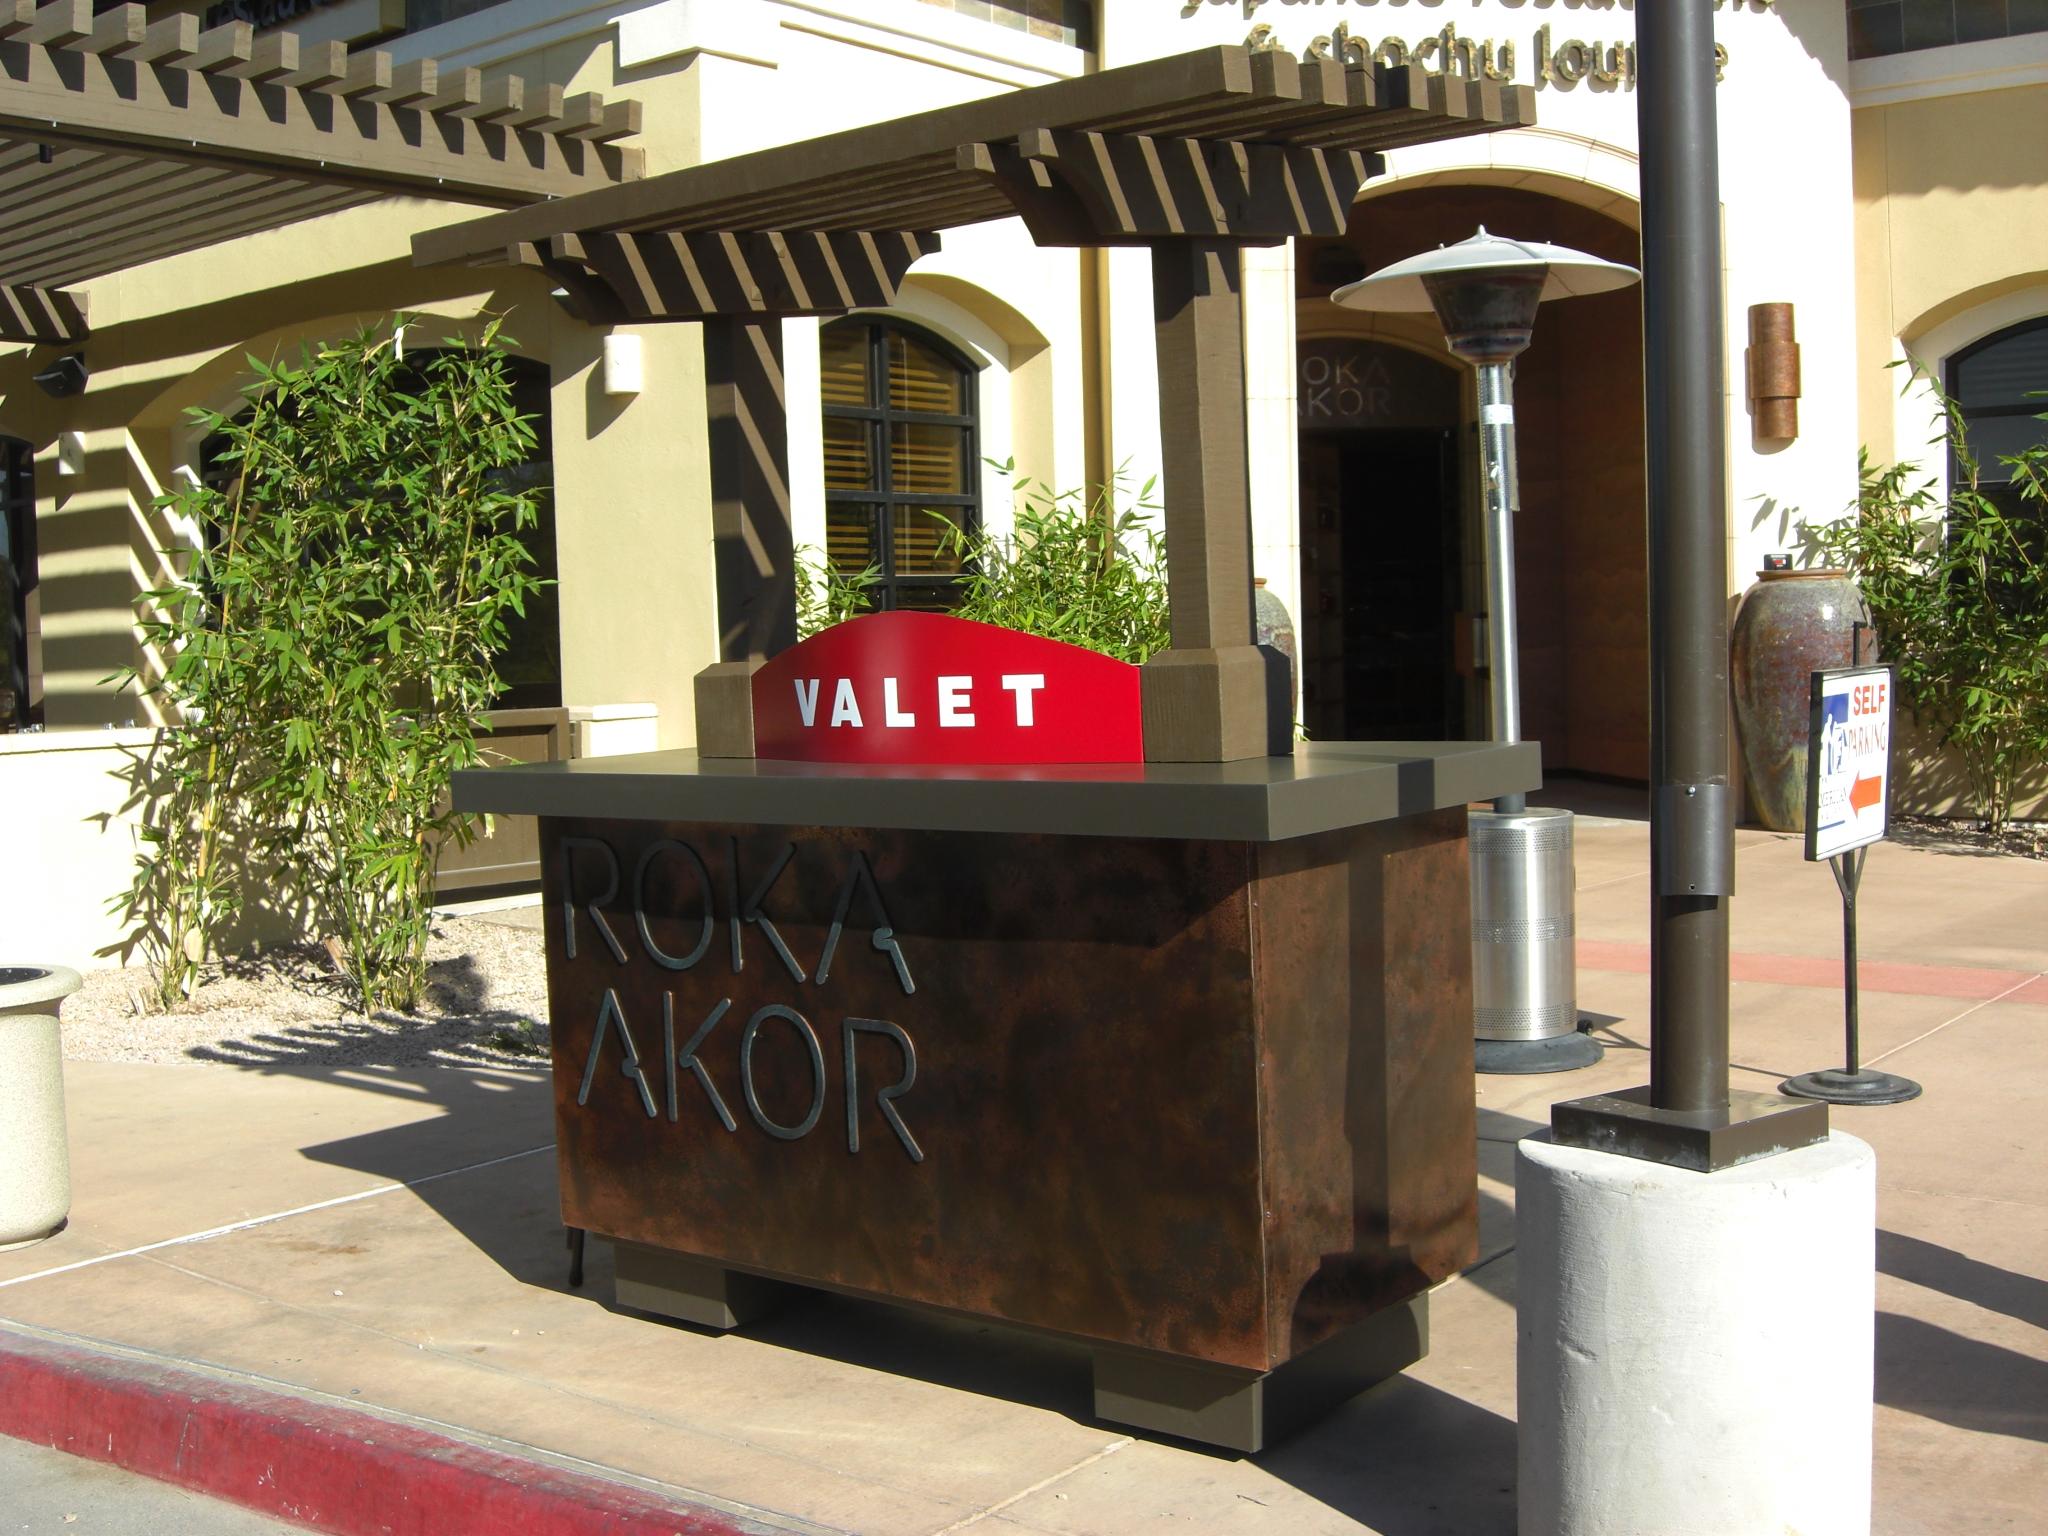 Copper clad valet podium for Roka Akor in Scottsdale, Arizona.